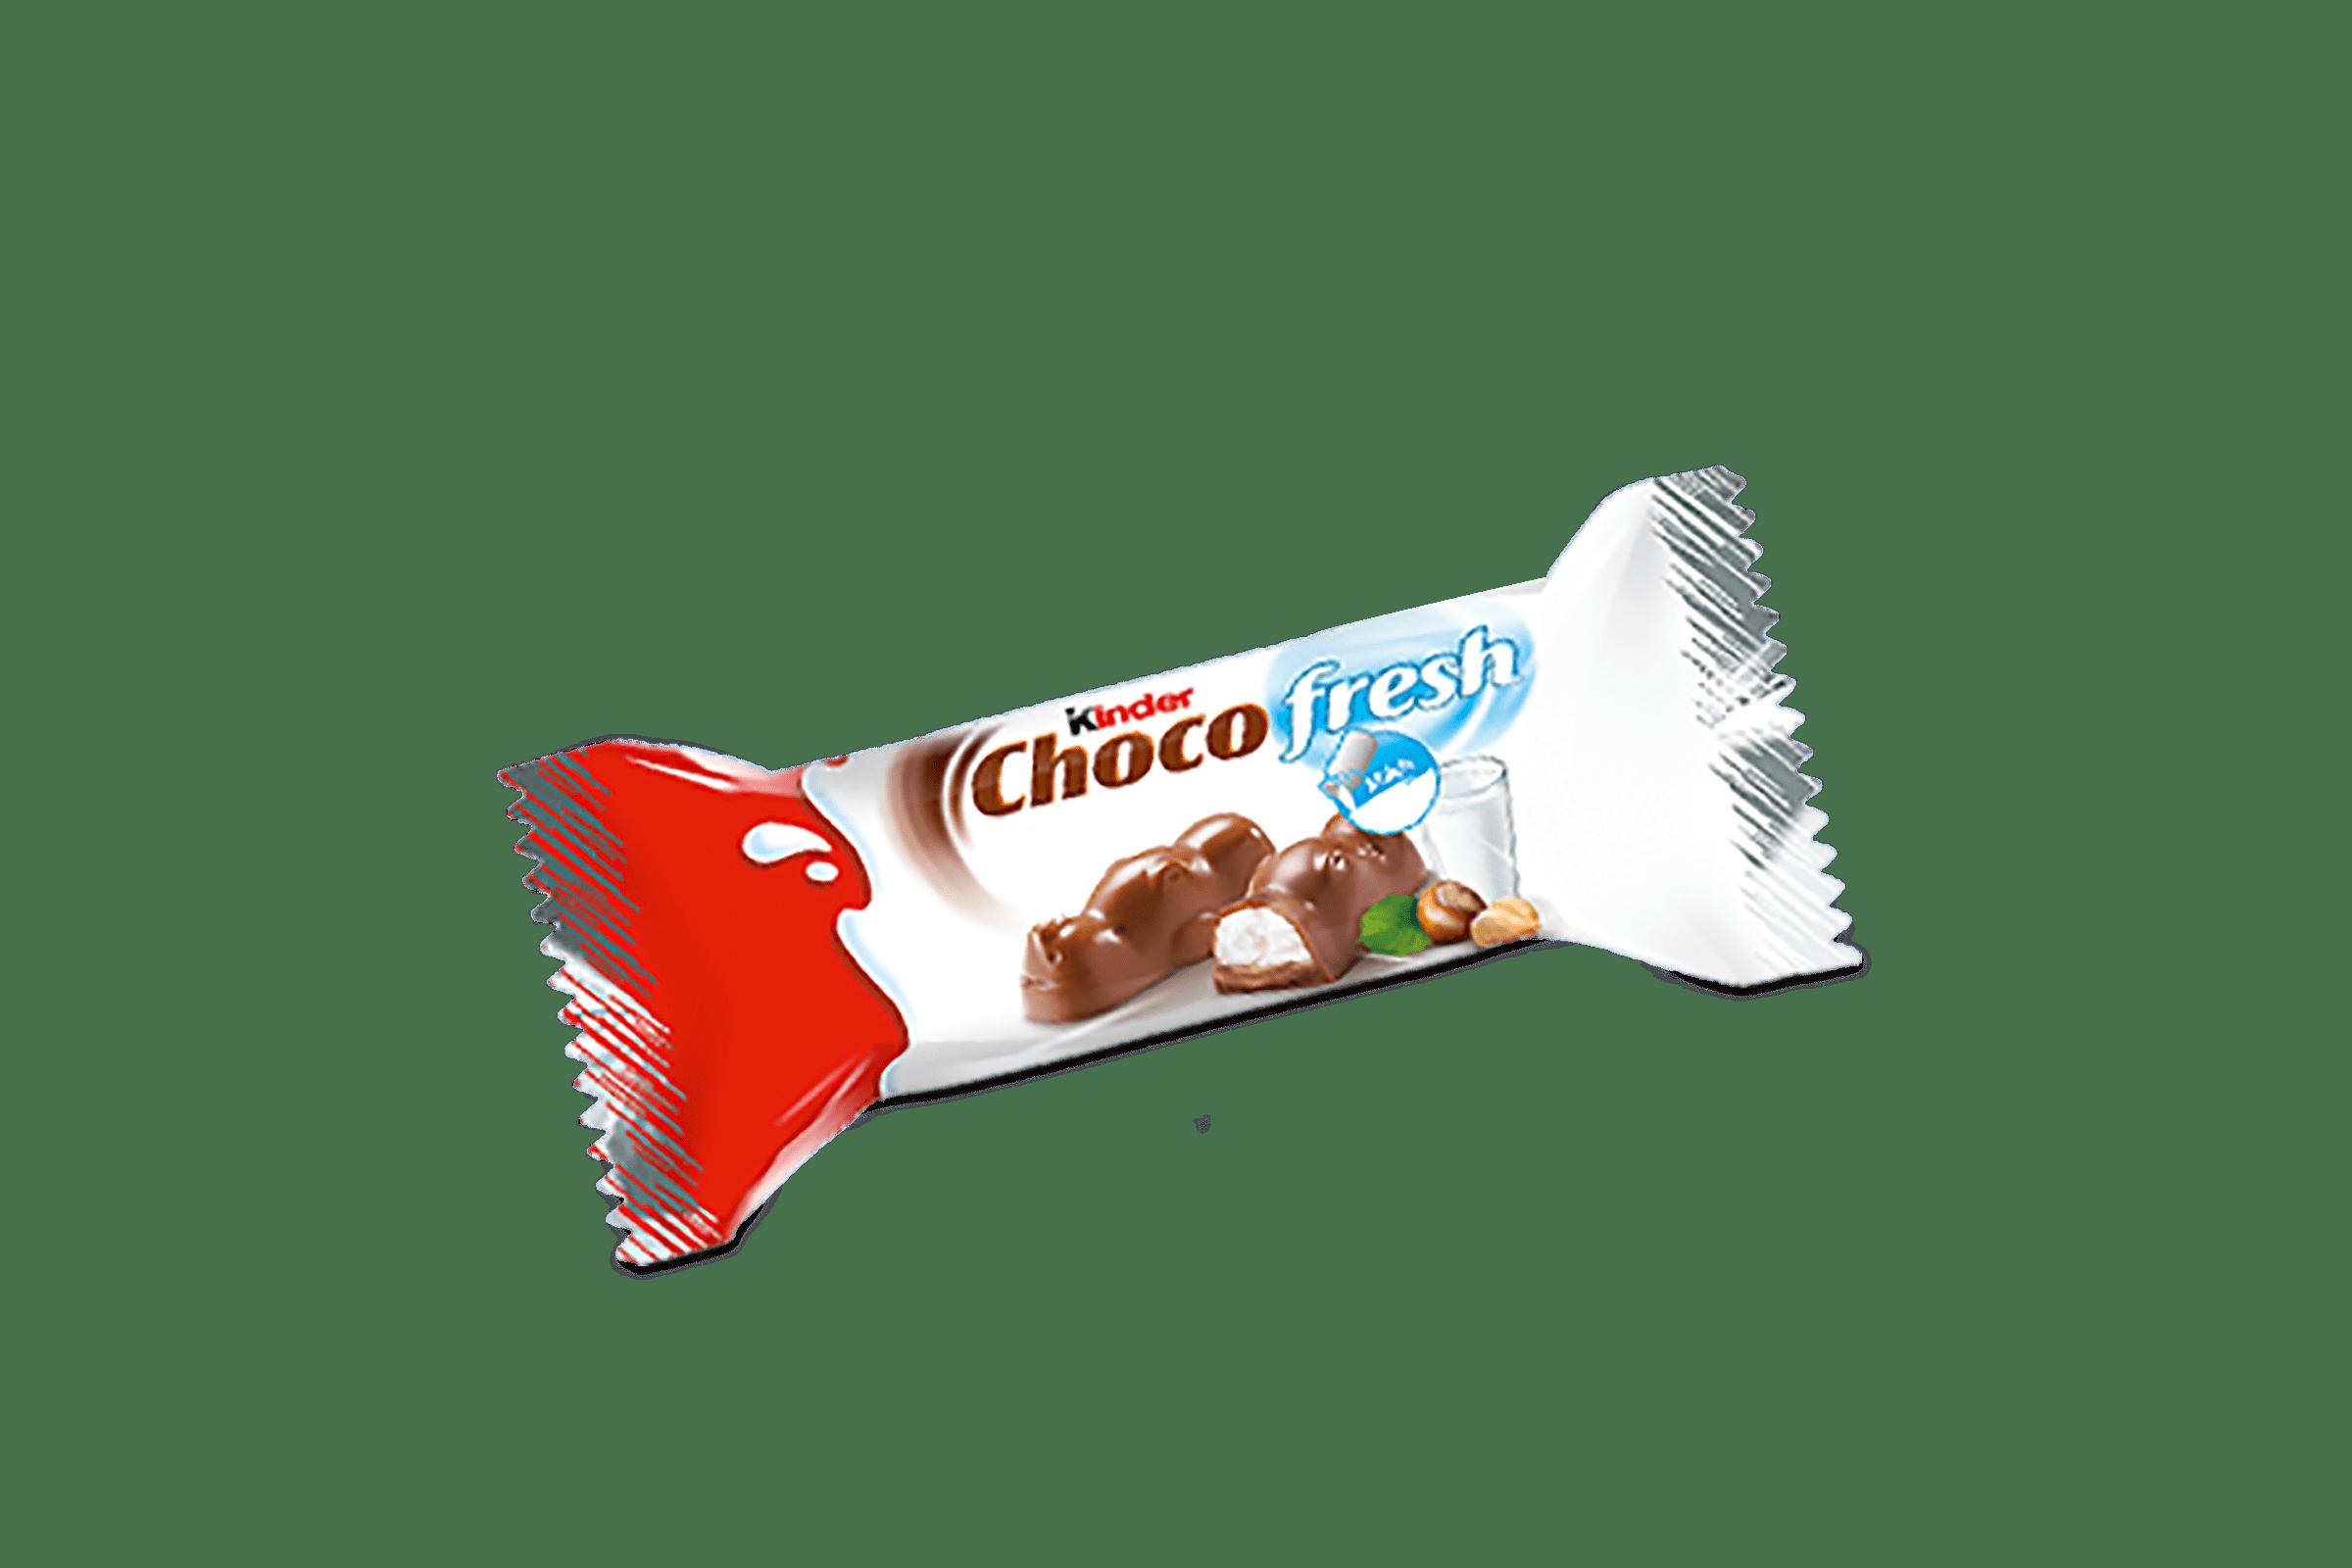 Kinder Choco Fresh 1